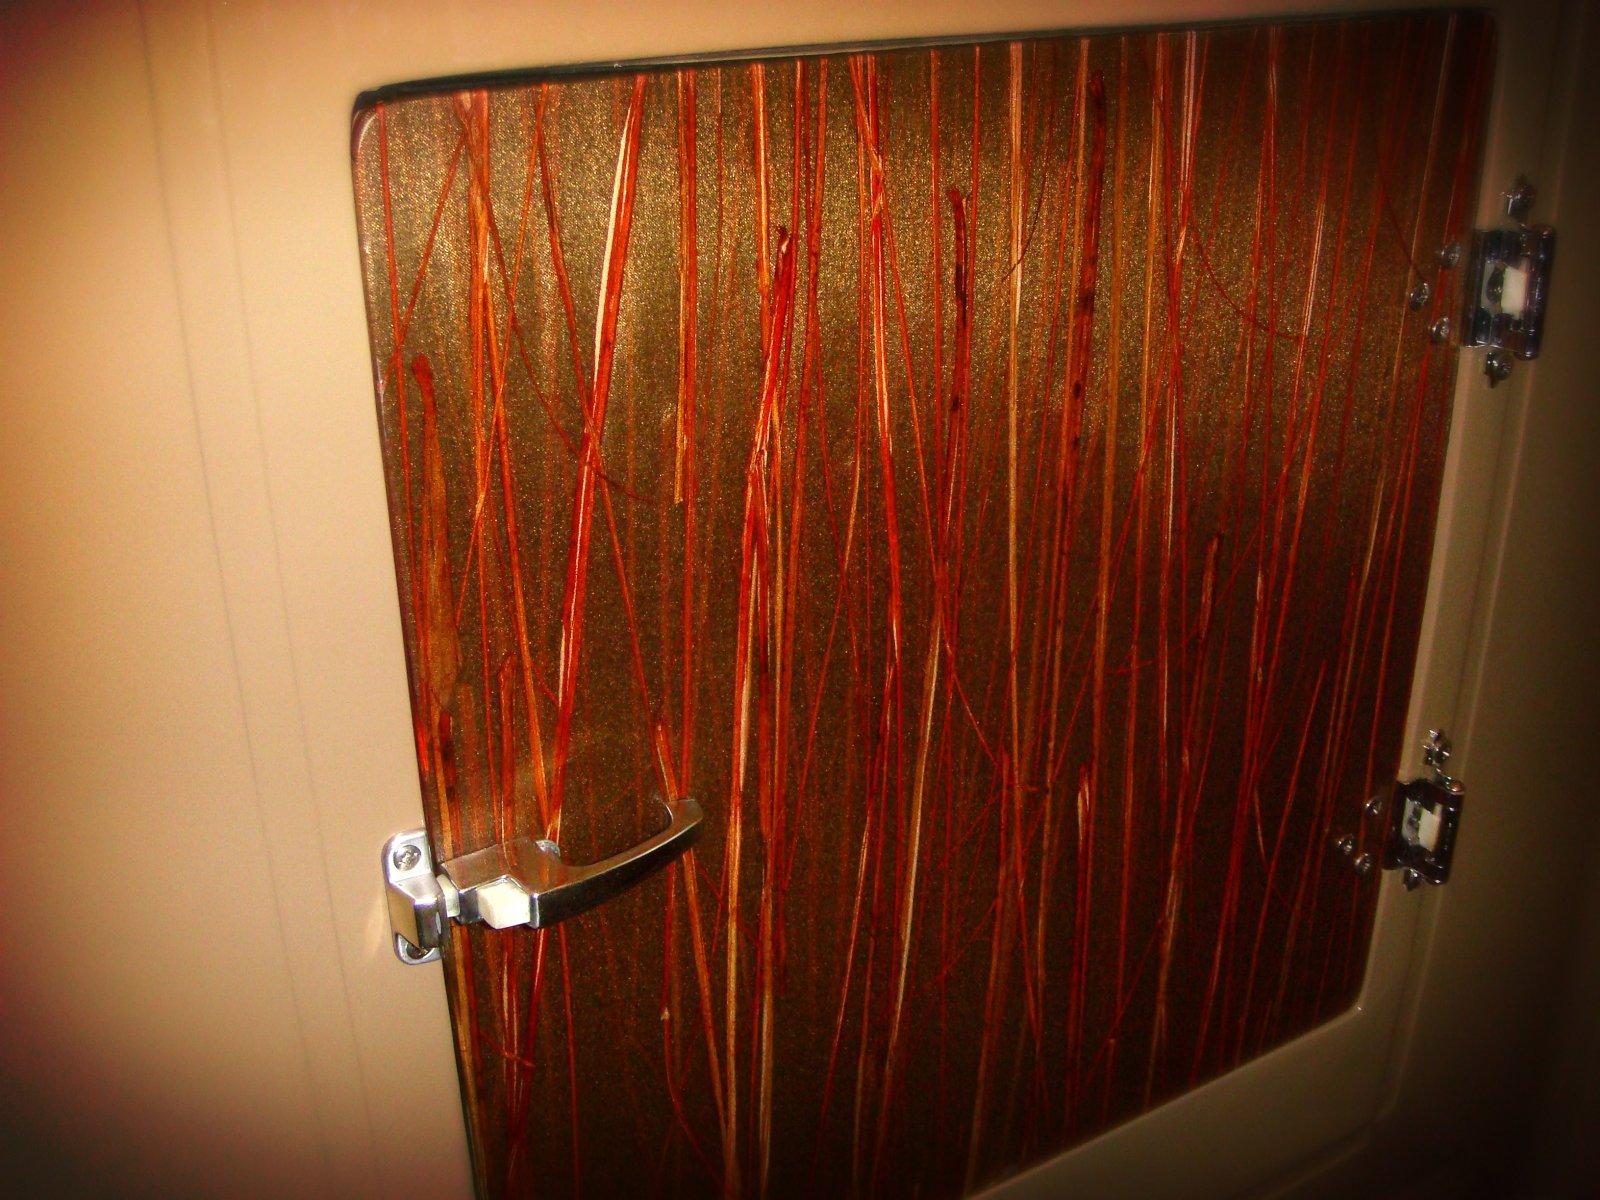 Click image for larger version  Name:Bathroom door.jpg Views:146 Size:331.8 KB ID:177957